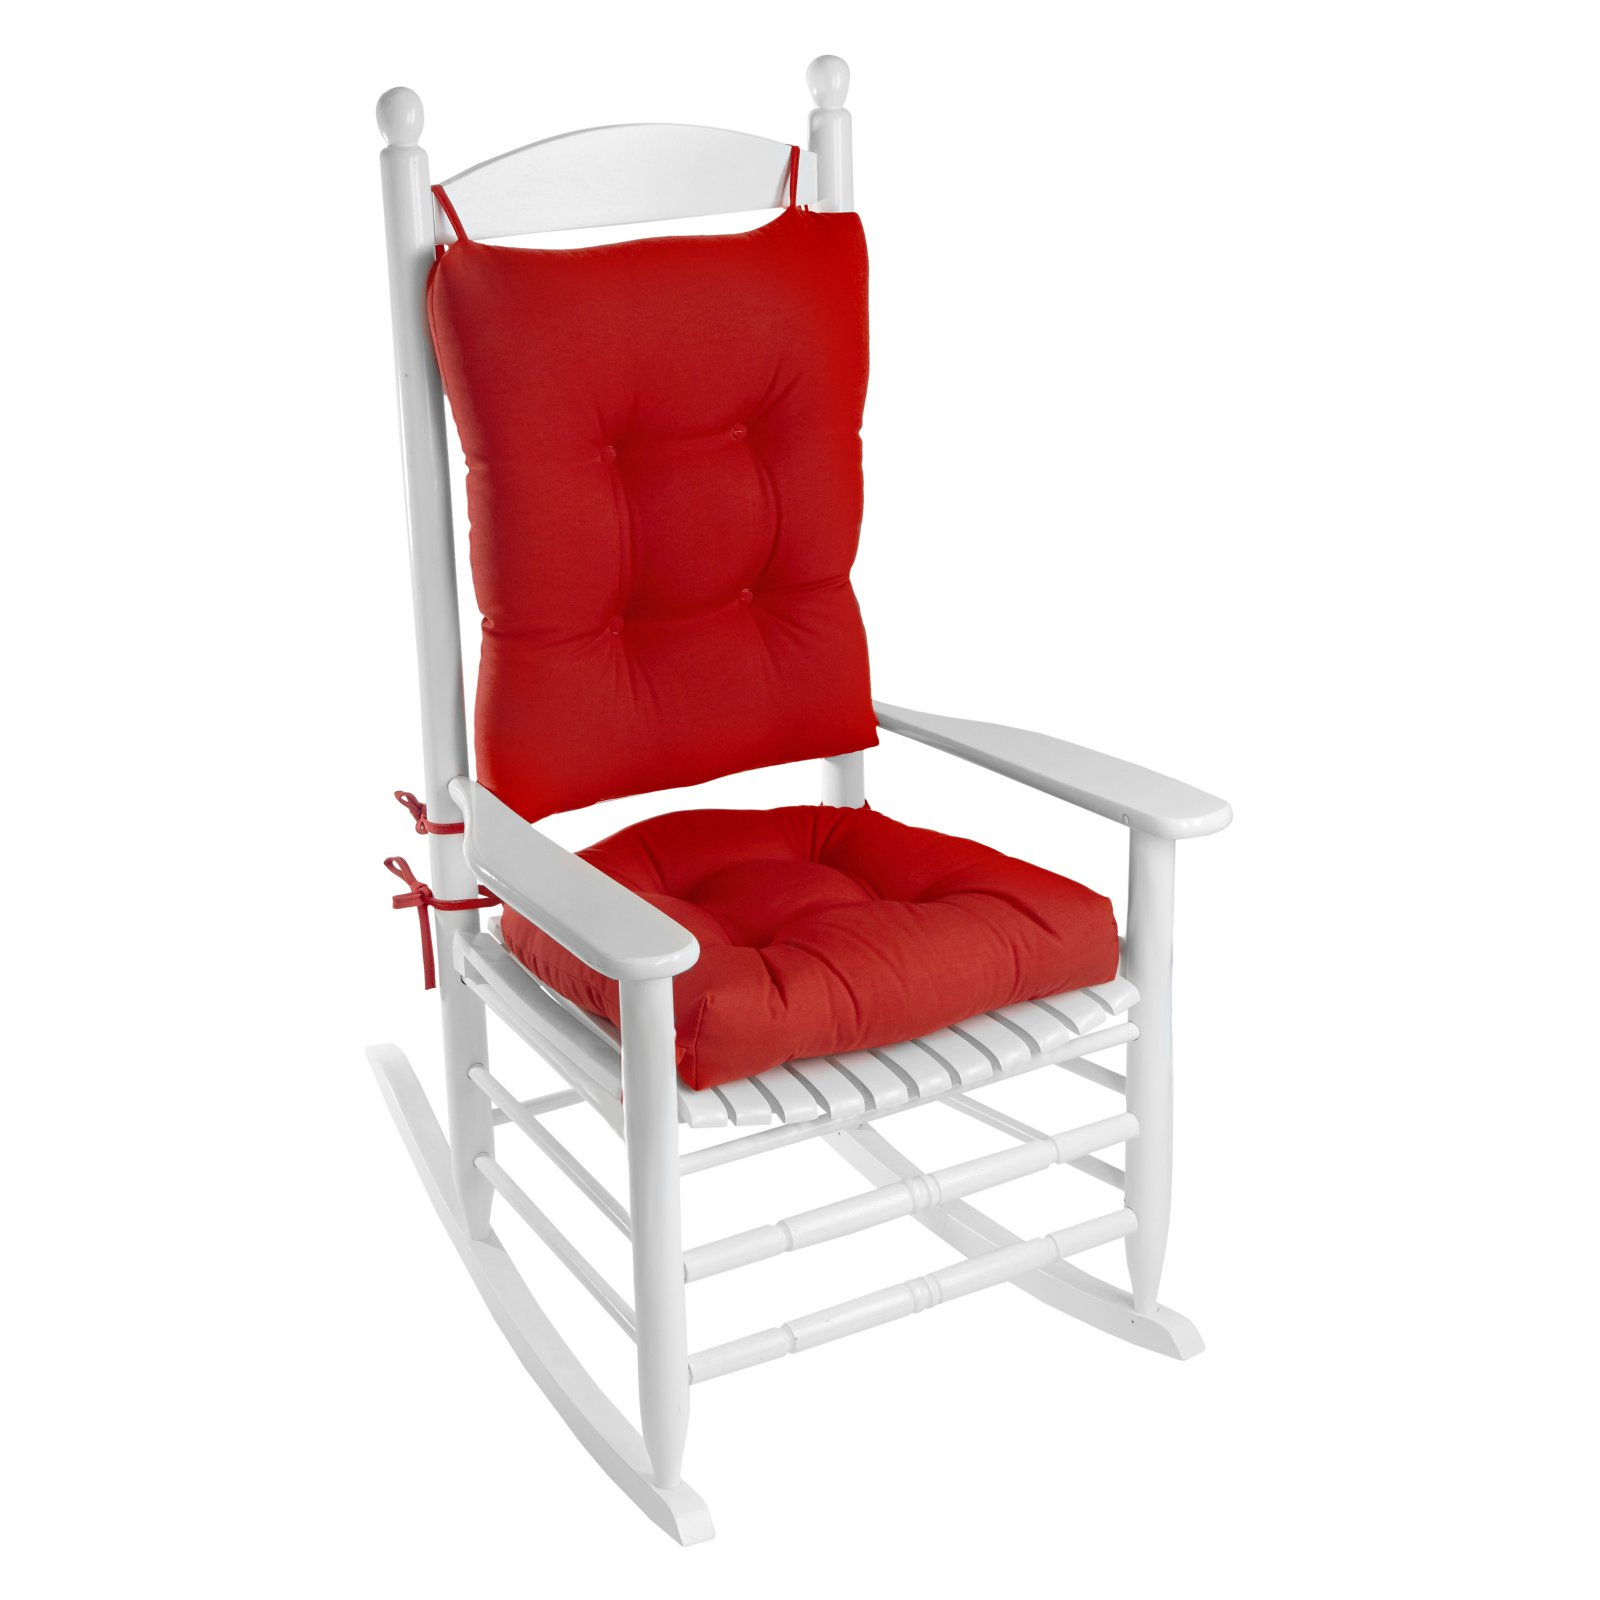 Porch Outdoor Indoor Red Rocking Chair